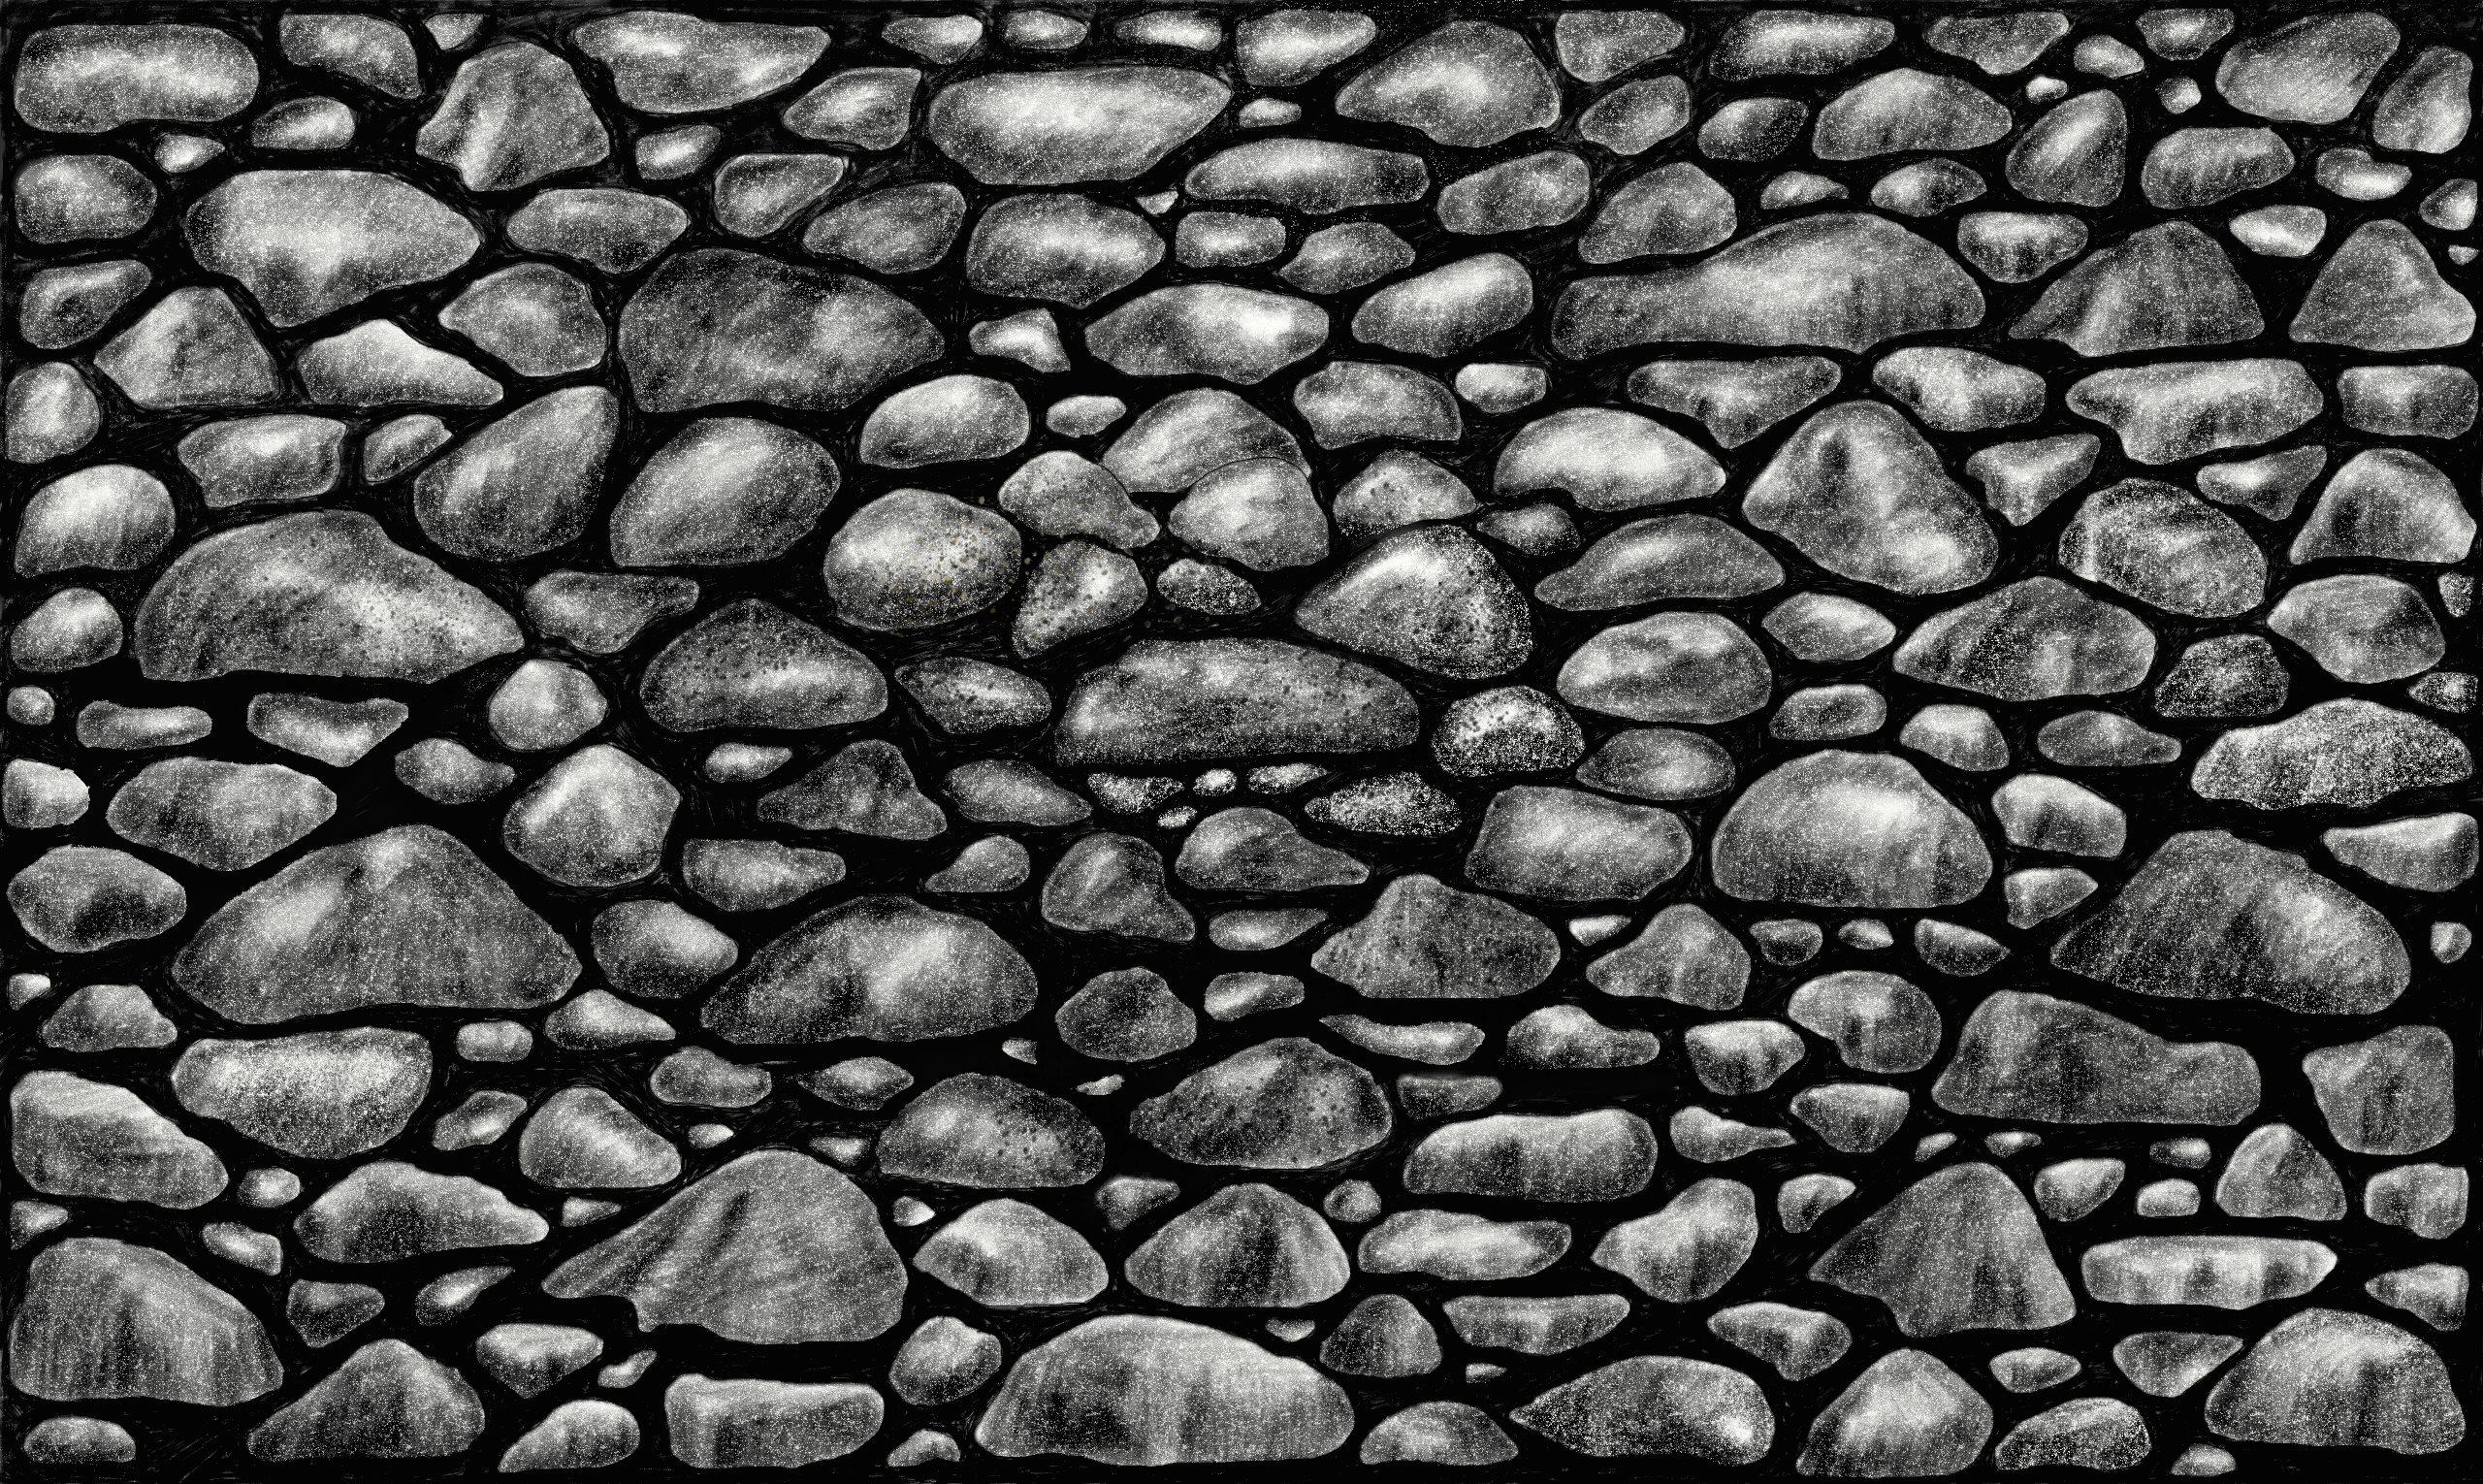 stones--b-w-